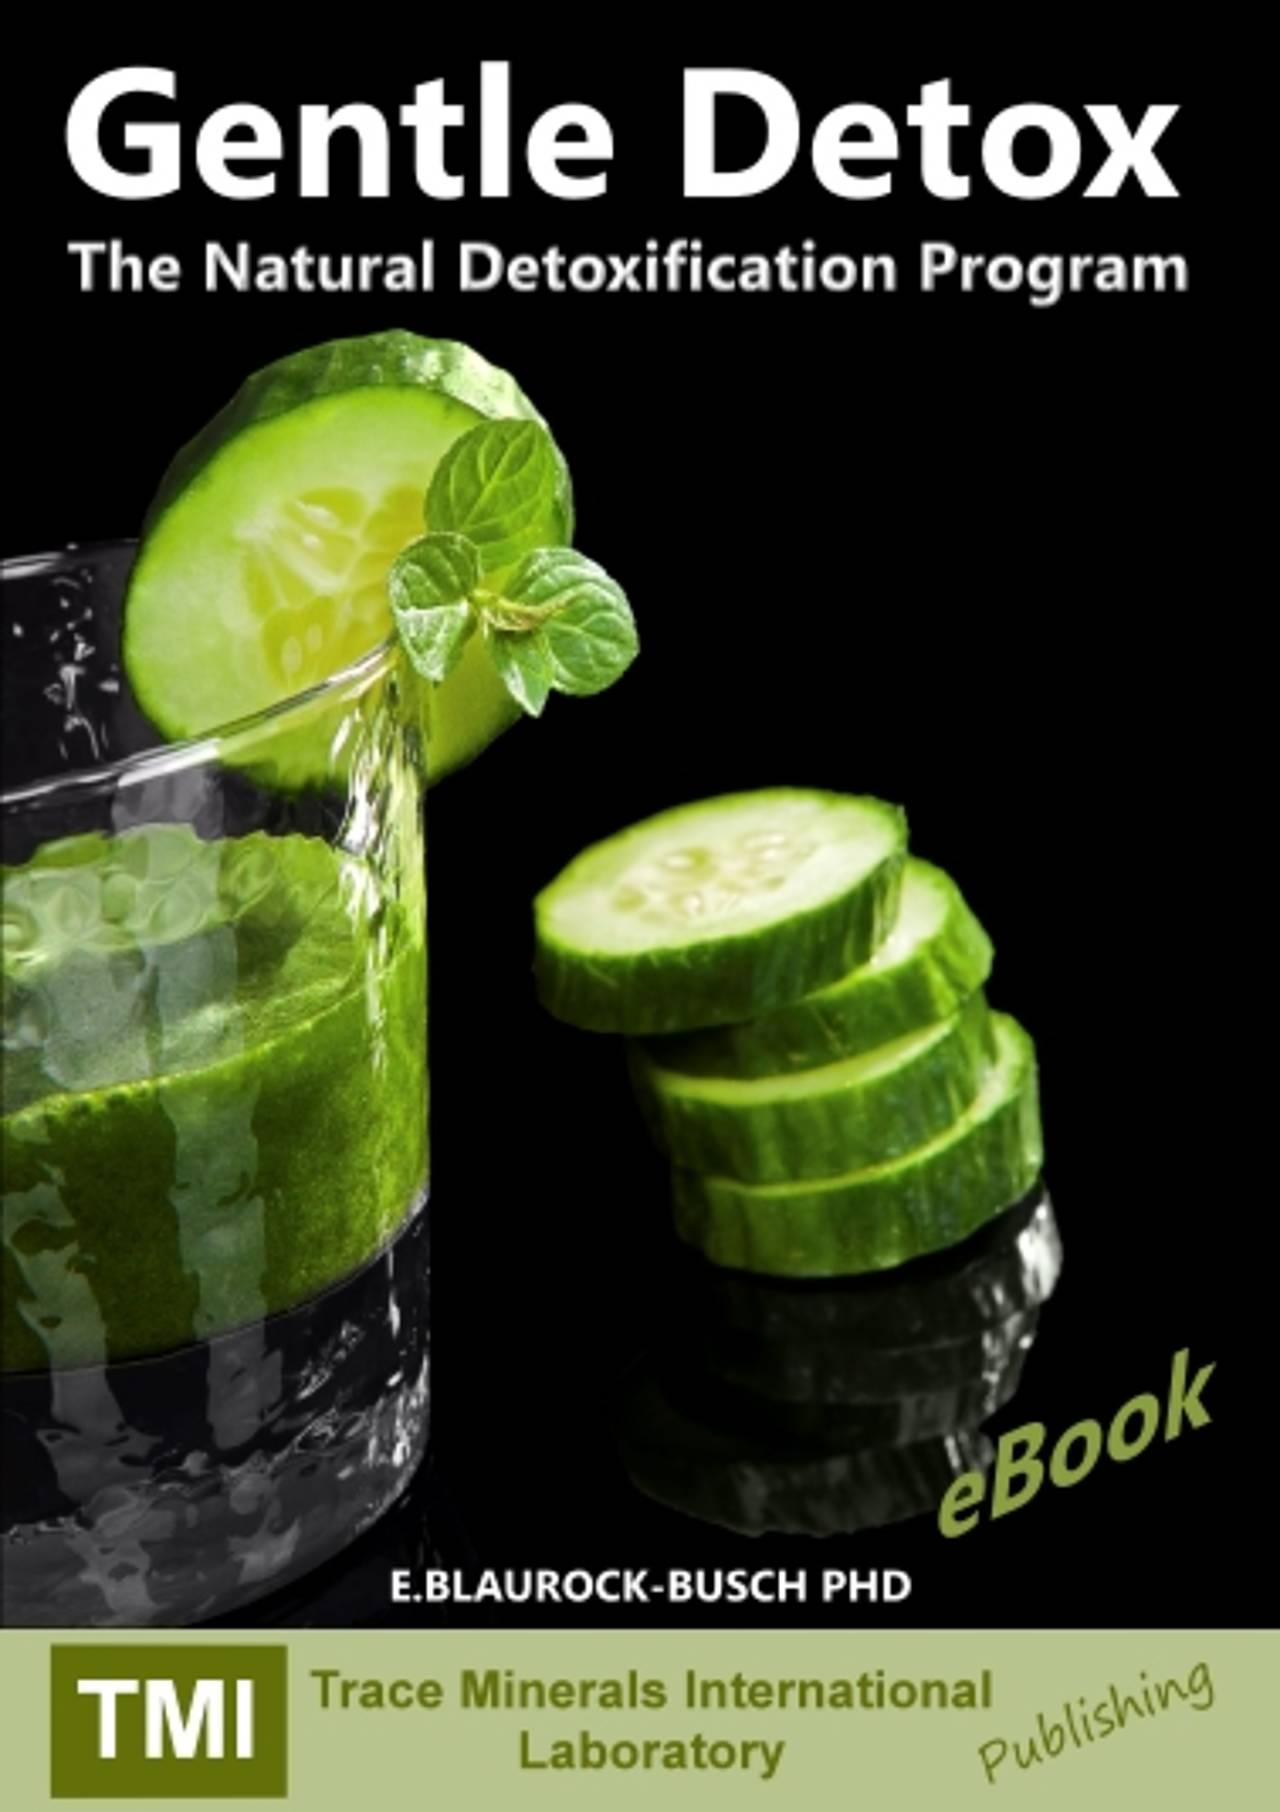 Gentle Detox - The Natural Detoxification Program Book Cover